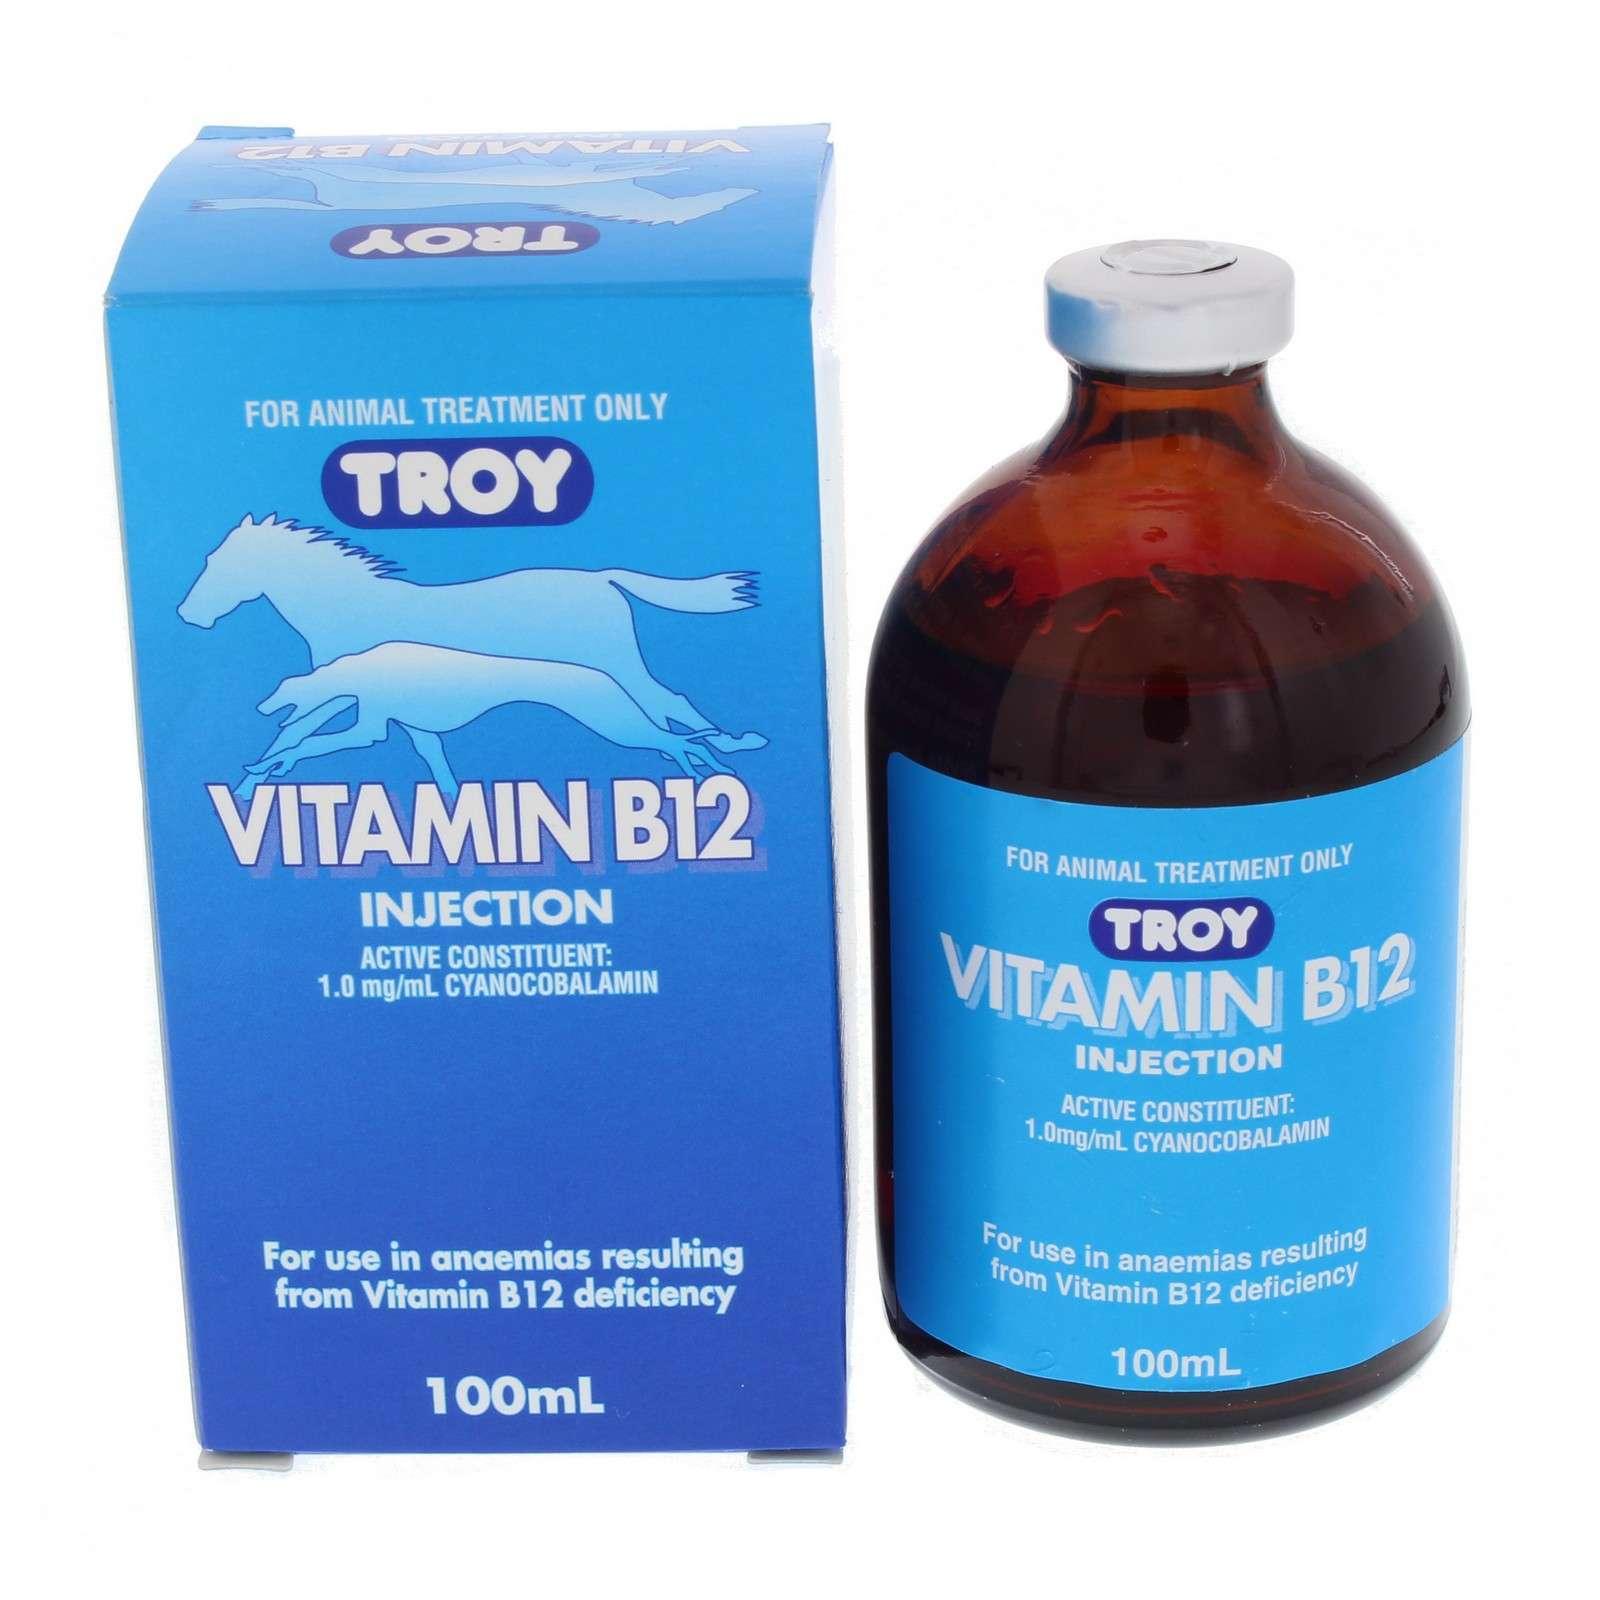 Vitamin B12 Shots For Dogs